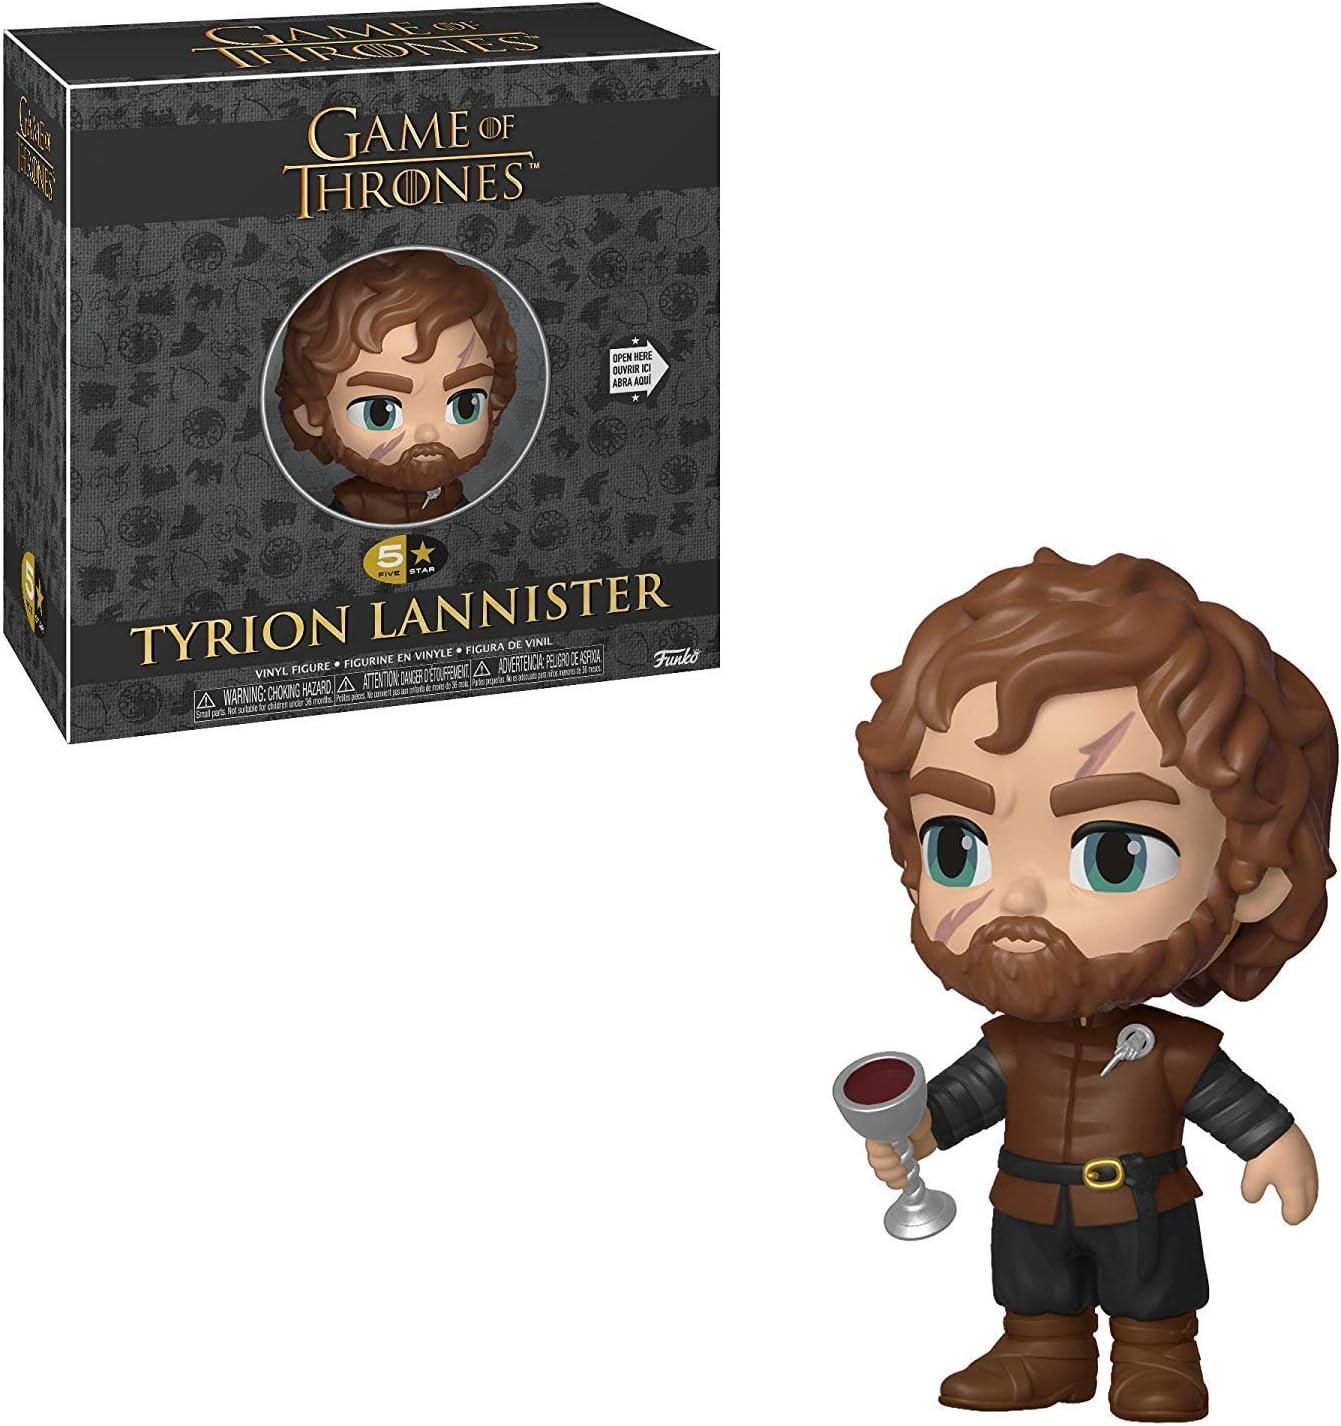 Amazon.com: Juego de tronos: figura de acción de Tyrion ...